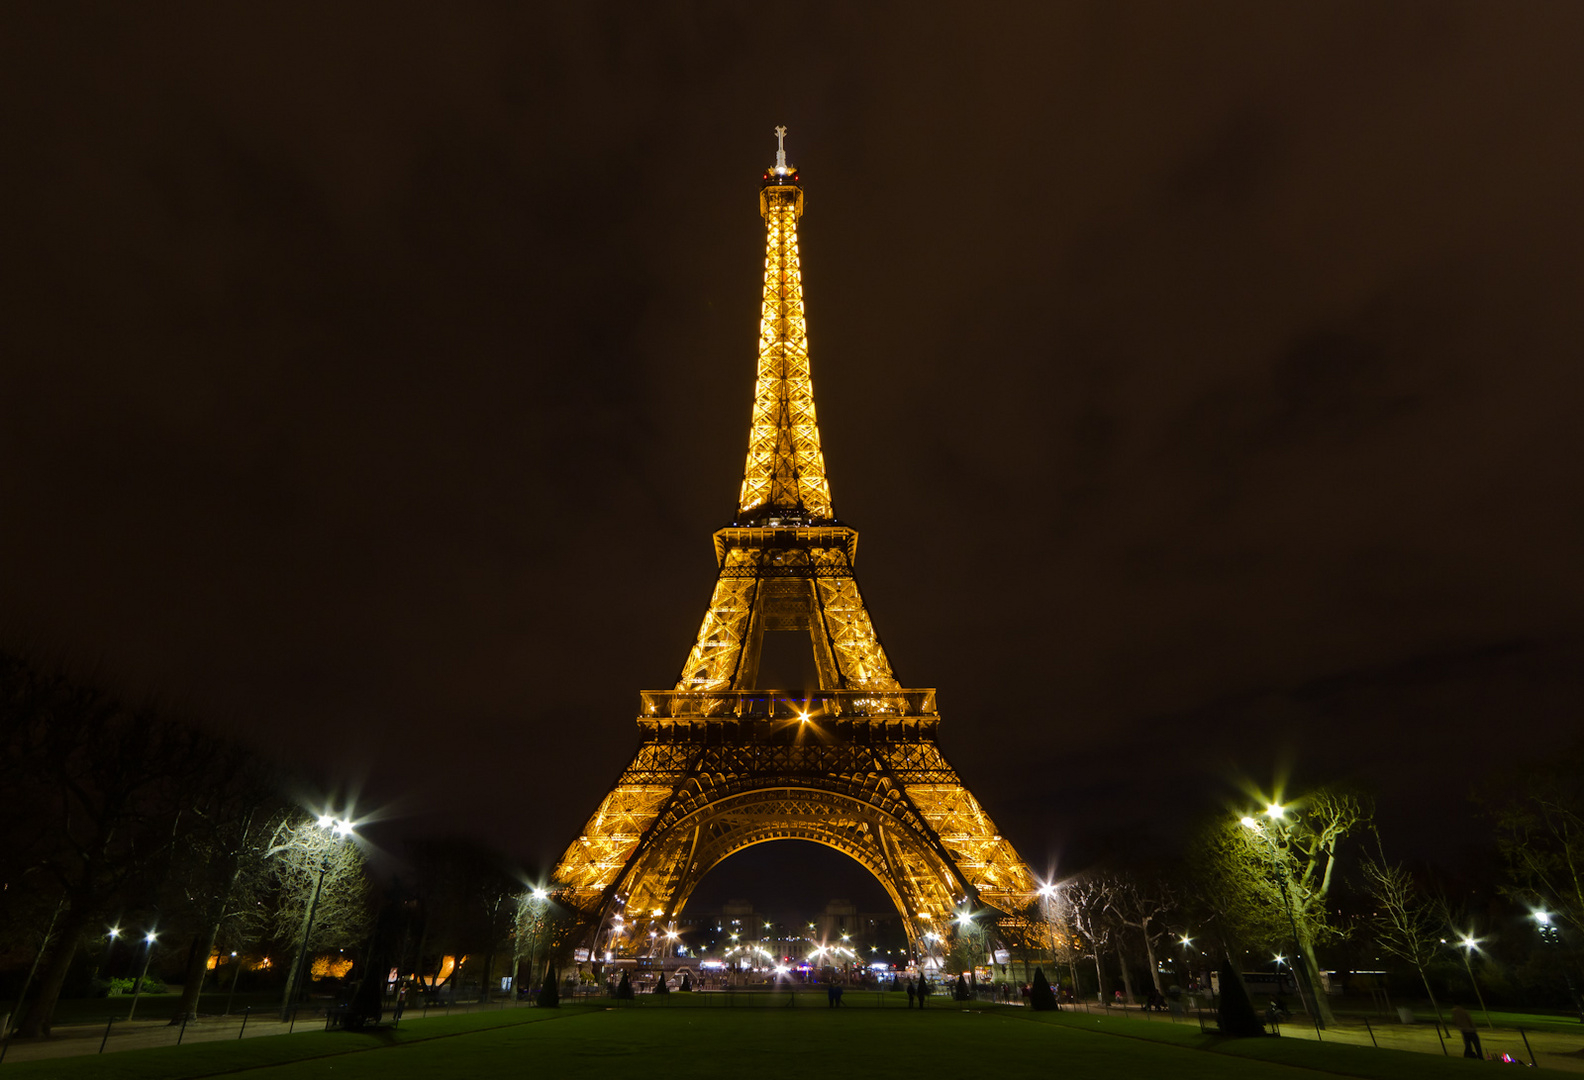 eiffelturm bei nacht v2 foto bild europe france paris bilder auf fotocommunity. Black Bedroom Furniture Sets. Home Design Ideas